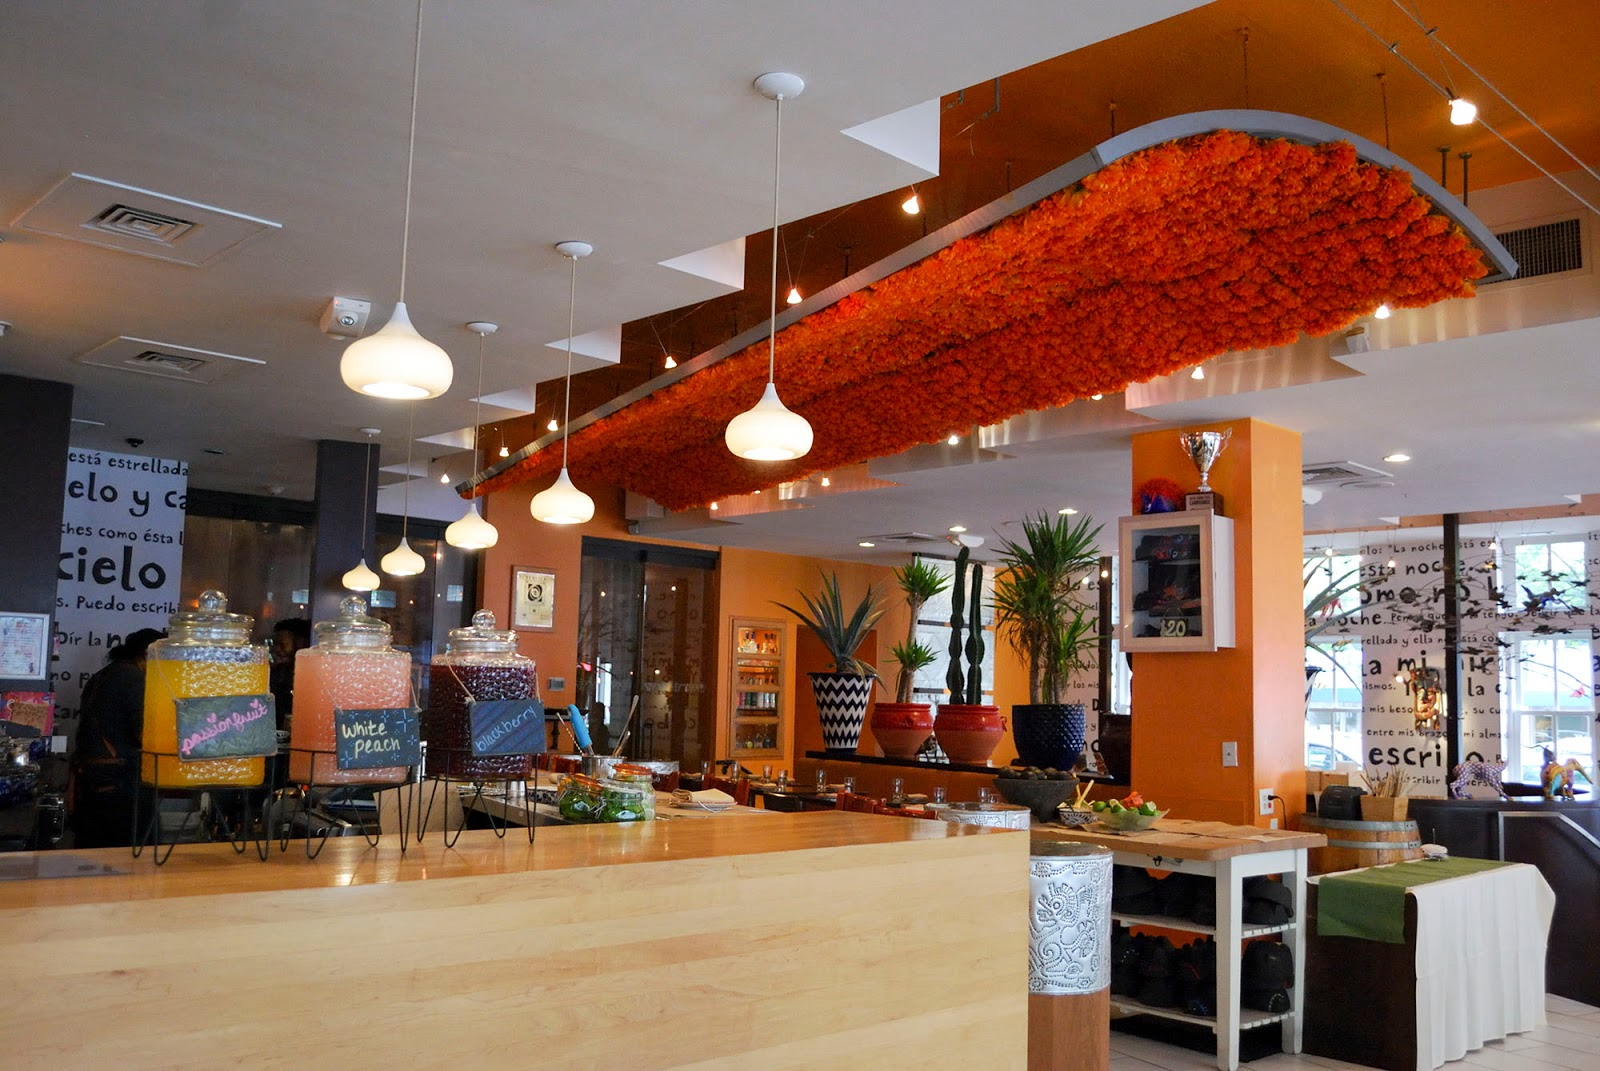 washington dc itinerary guide map restaurant oyamel cocina mexicana menu jose andres